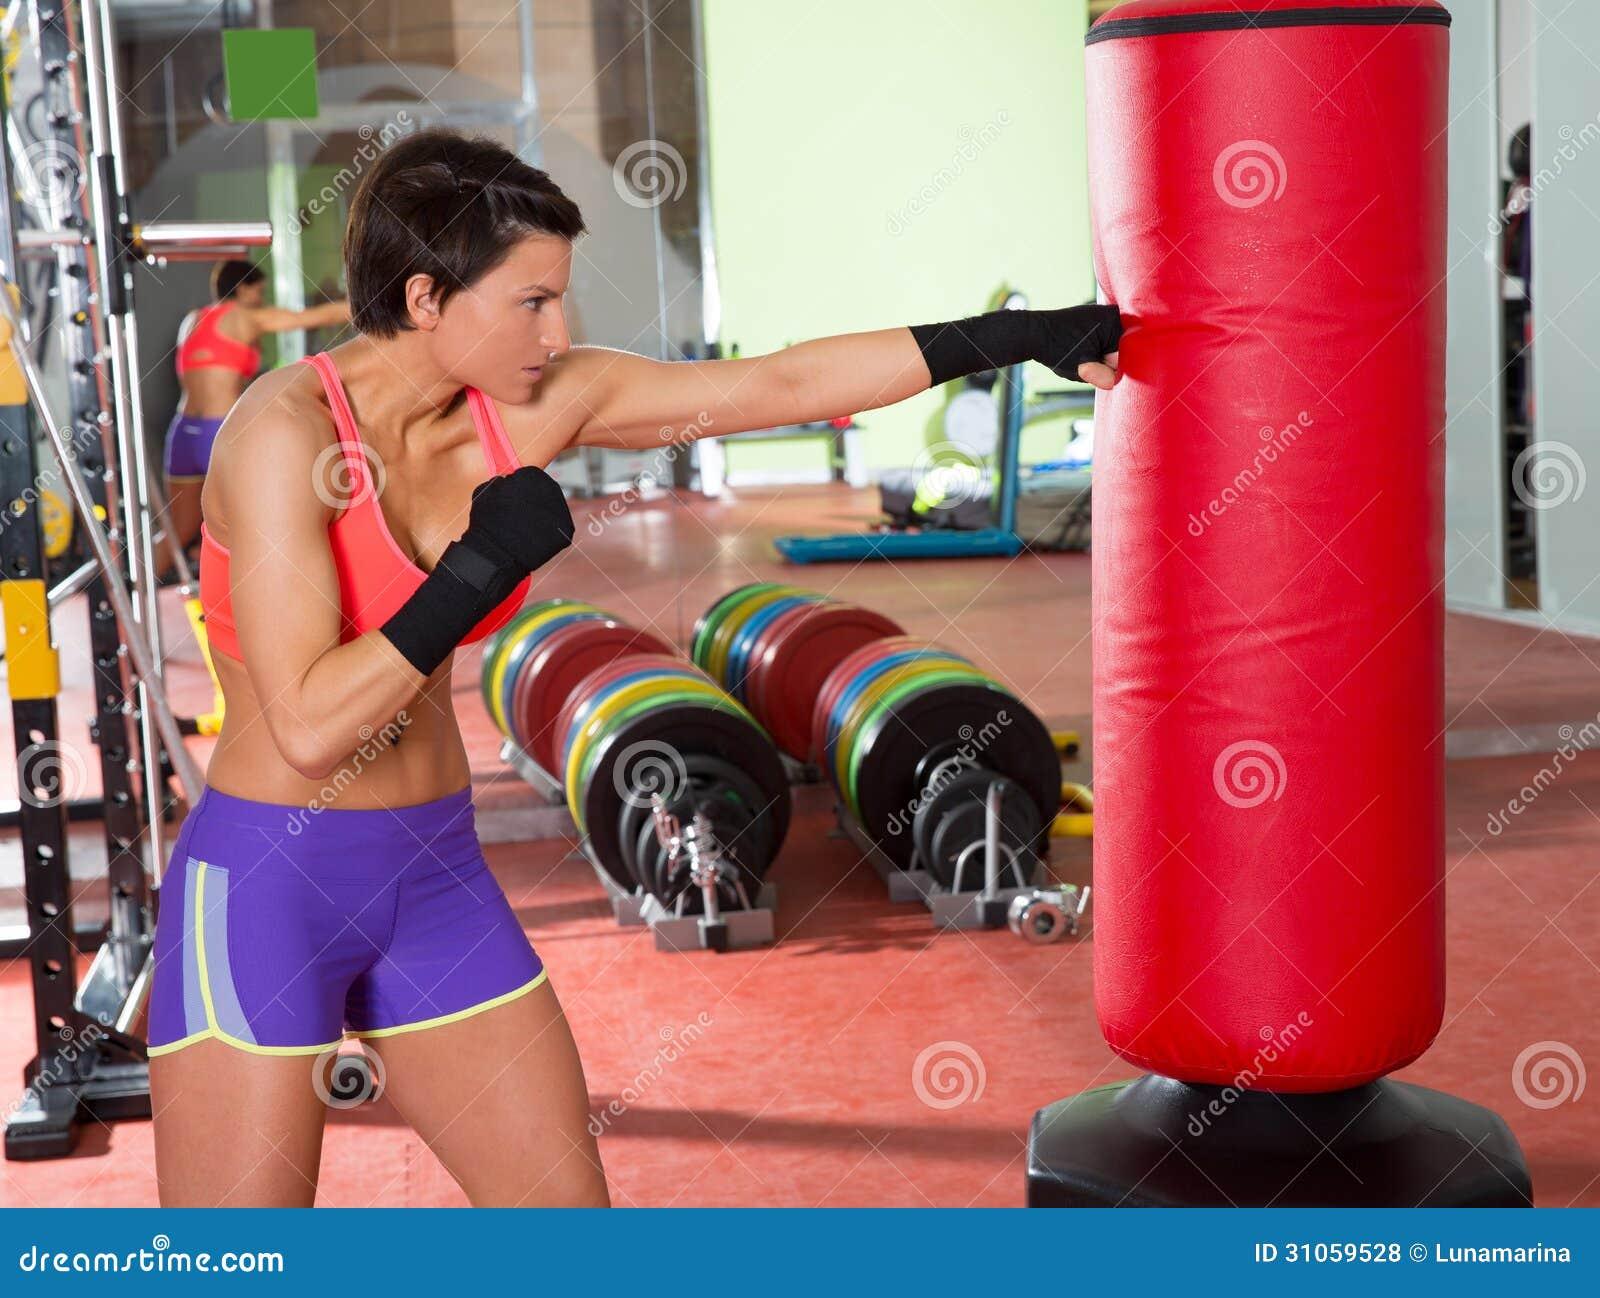 Boxe Crossfit Sac Photo Femme Le Stock Rouge Sable De Avec YfbmgyI76v